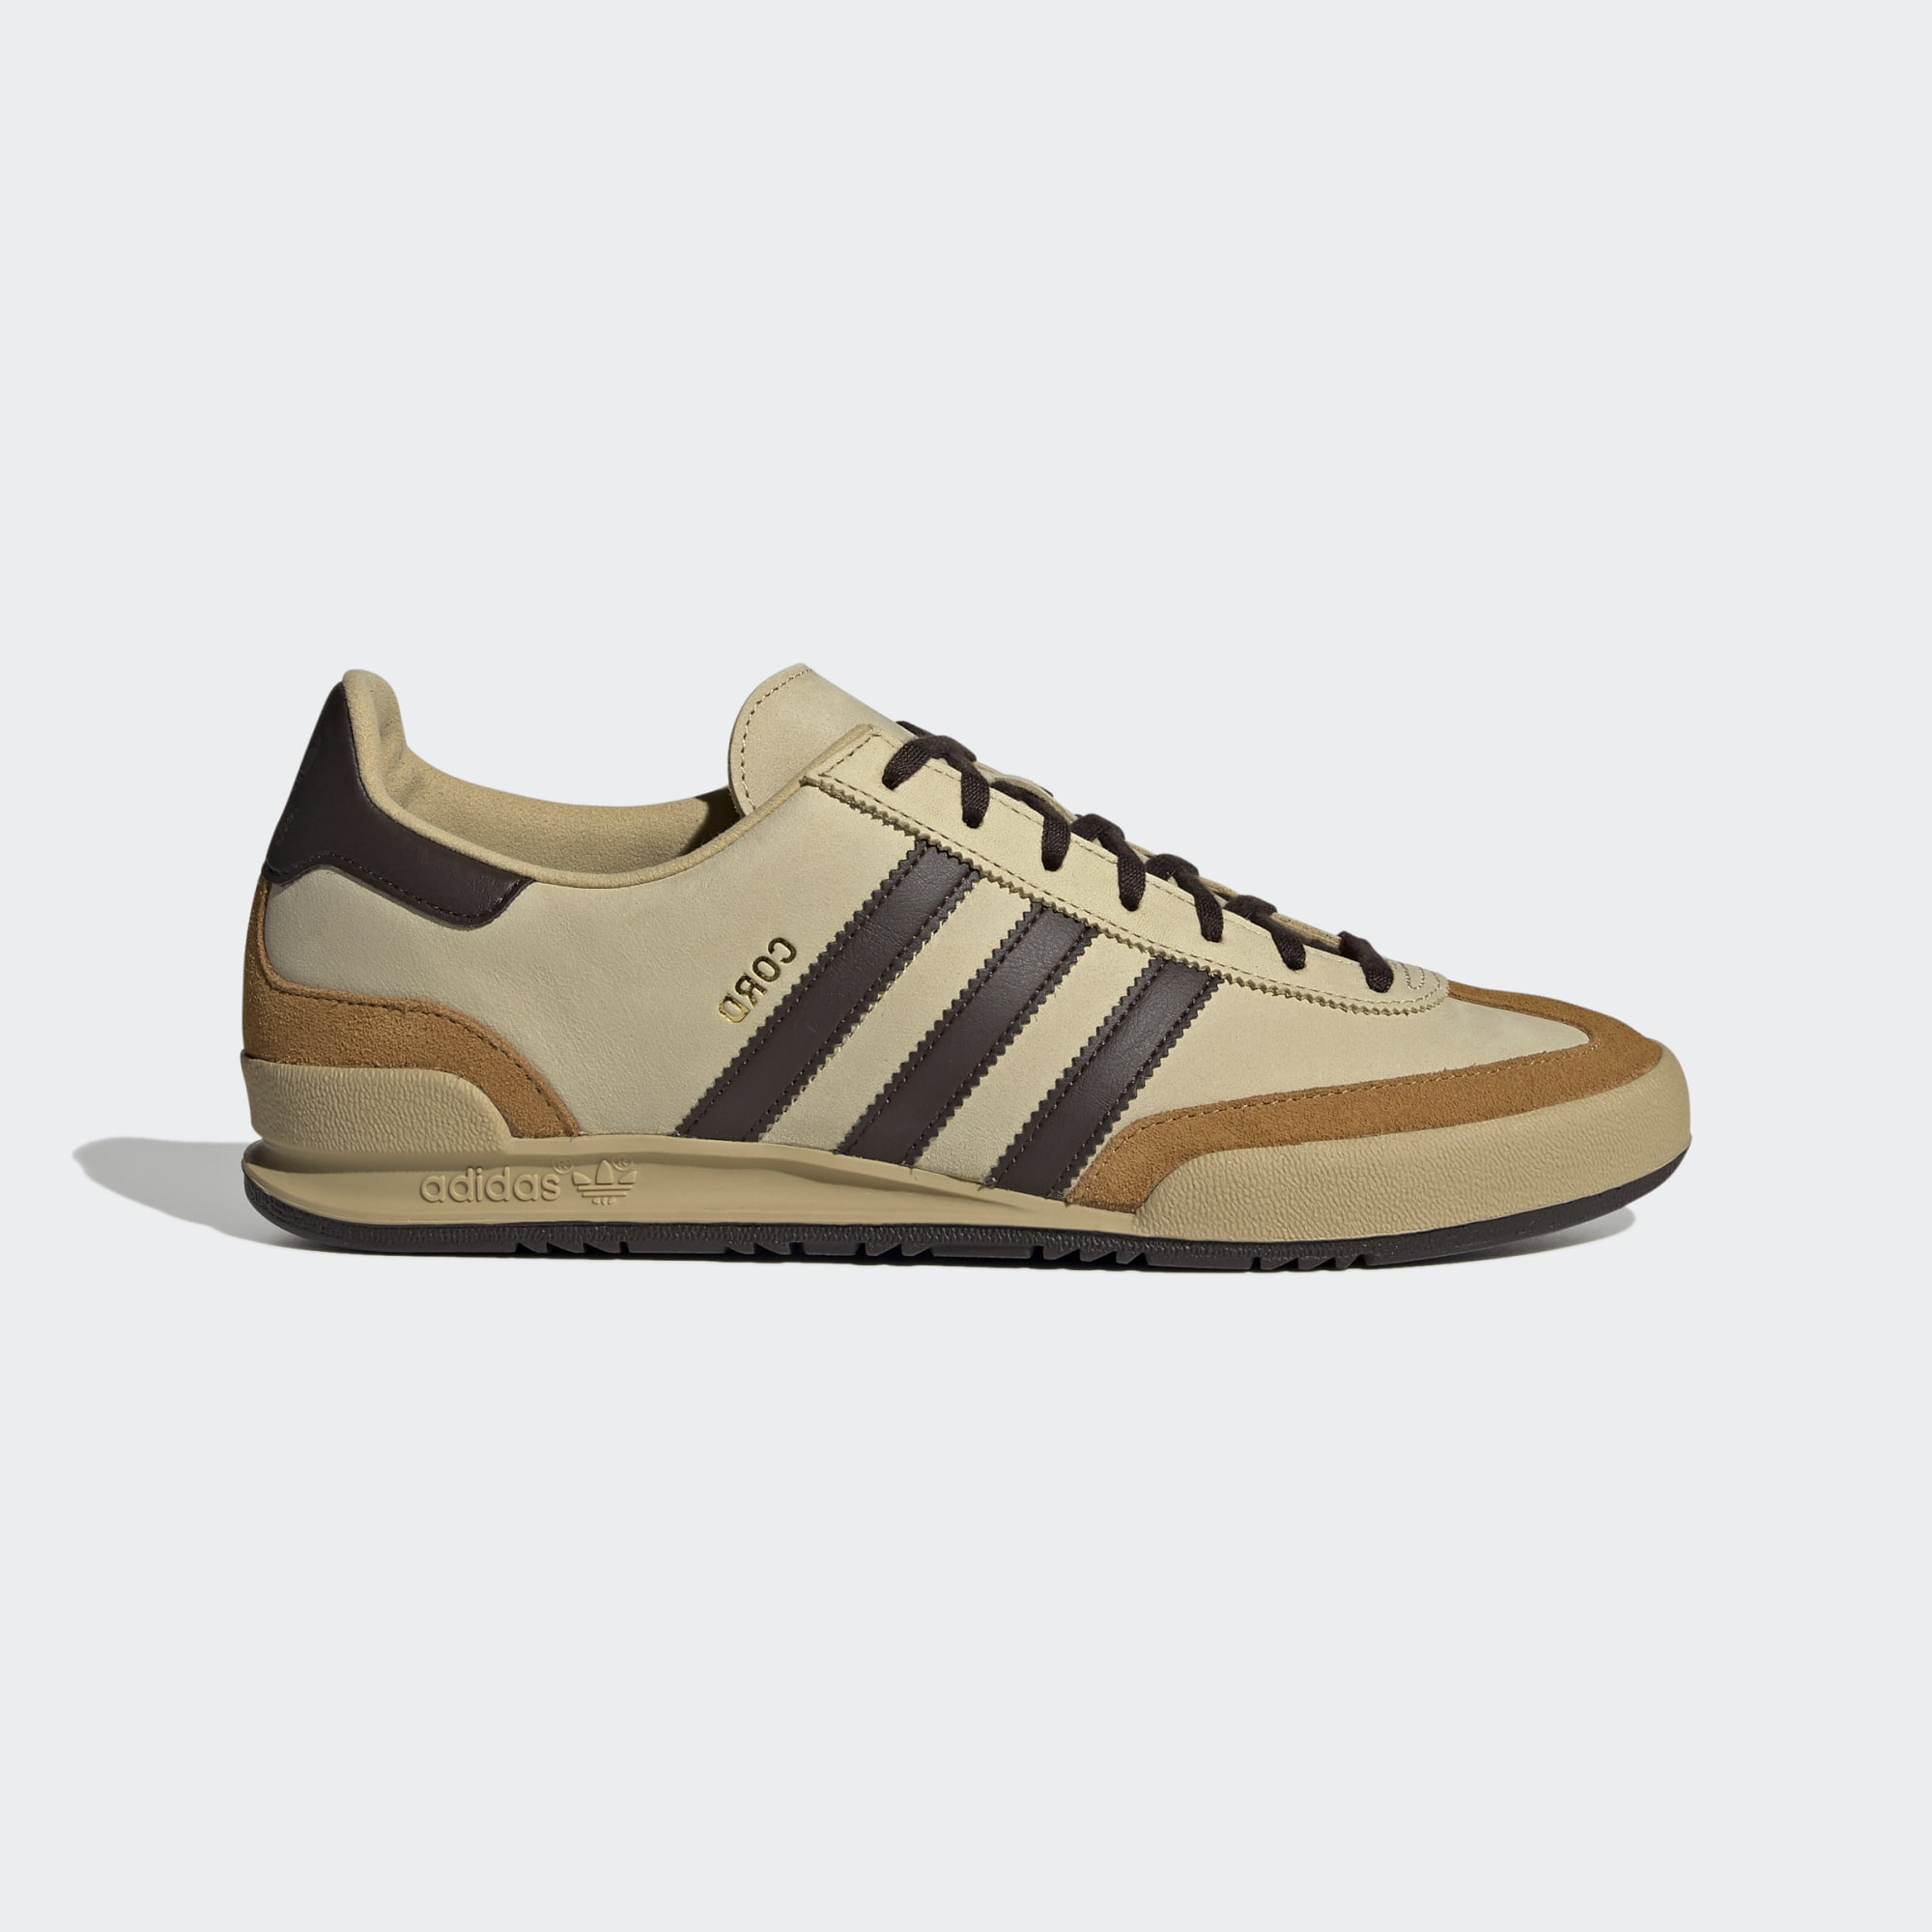 Cord_Shoes_Gul_FX5640_01_standard.jpg